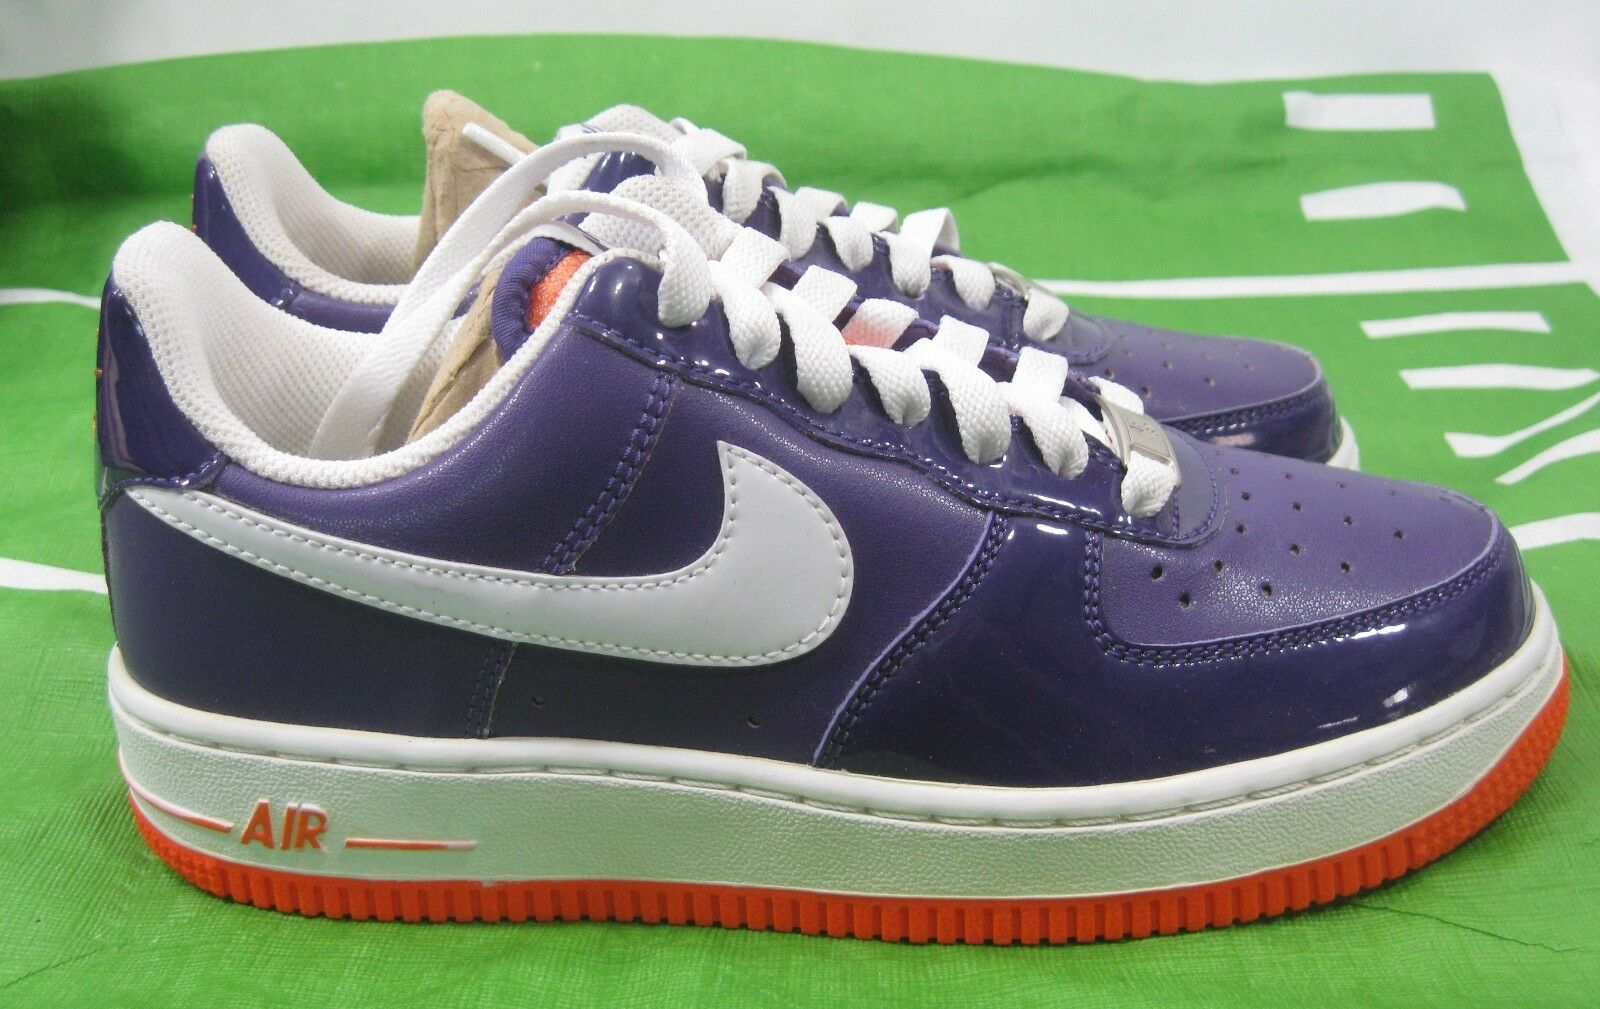 Nike Damens'S Air Force 1 '07 Basketball Schuhes Sneakers 315115-514 Größe 6.5